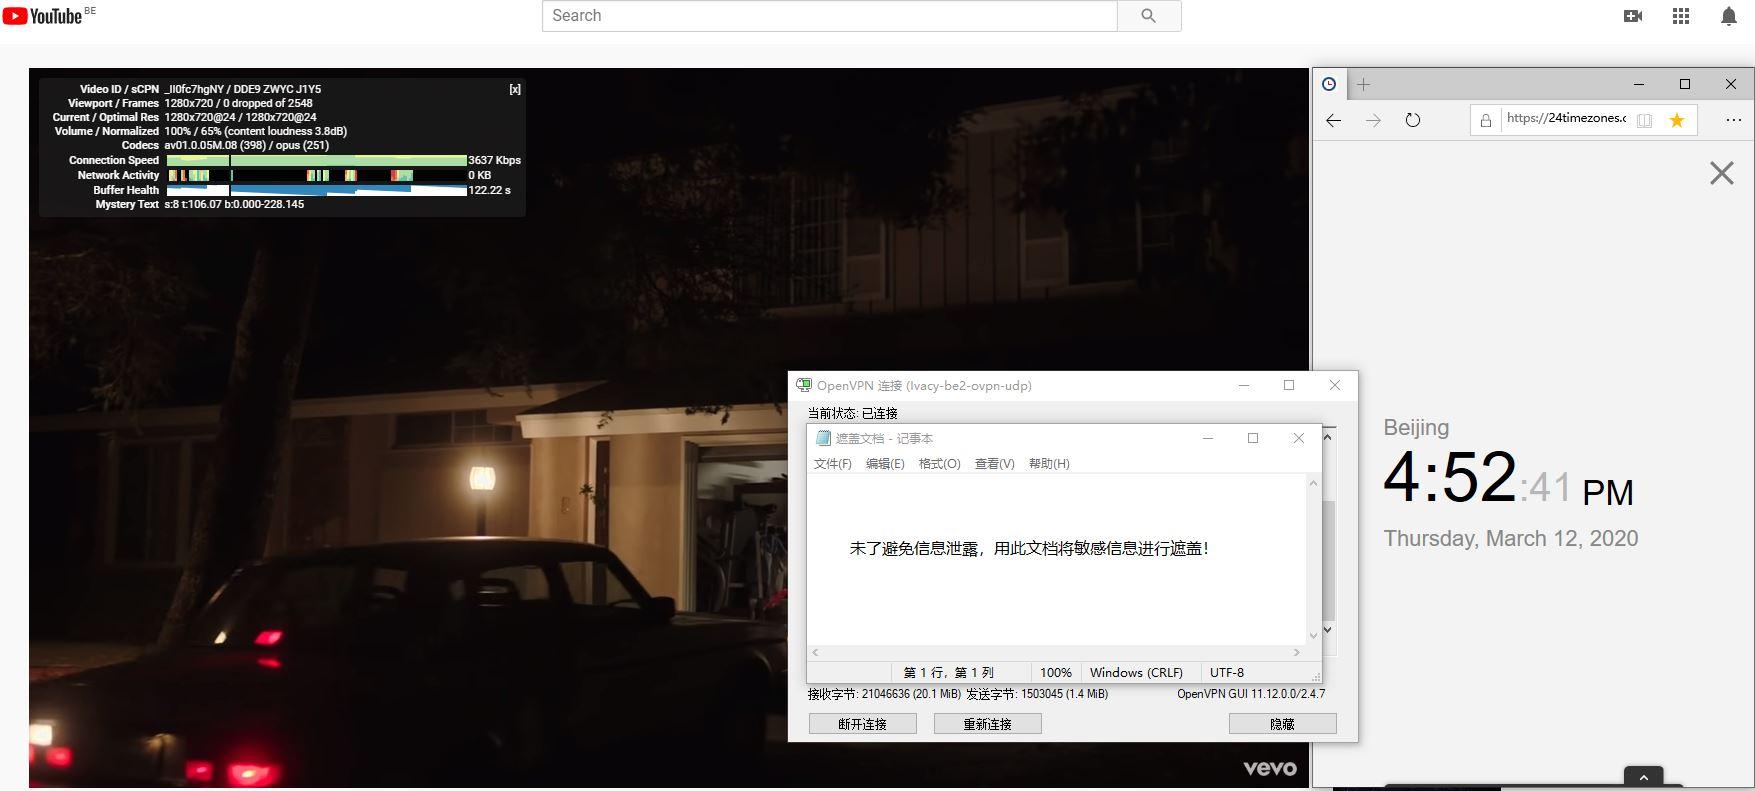 Windows10 IvacyVPN OpenVPN BE-2 中国VPN翻墙 科学上网 Youtube测速 - 20200312